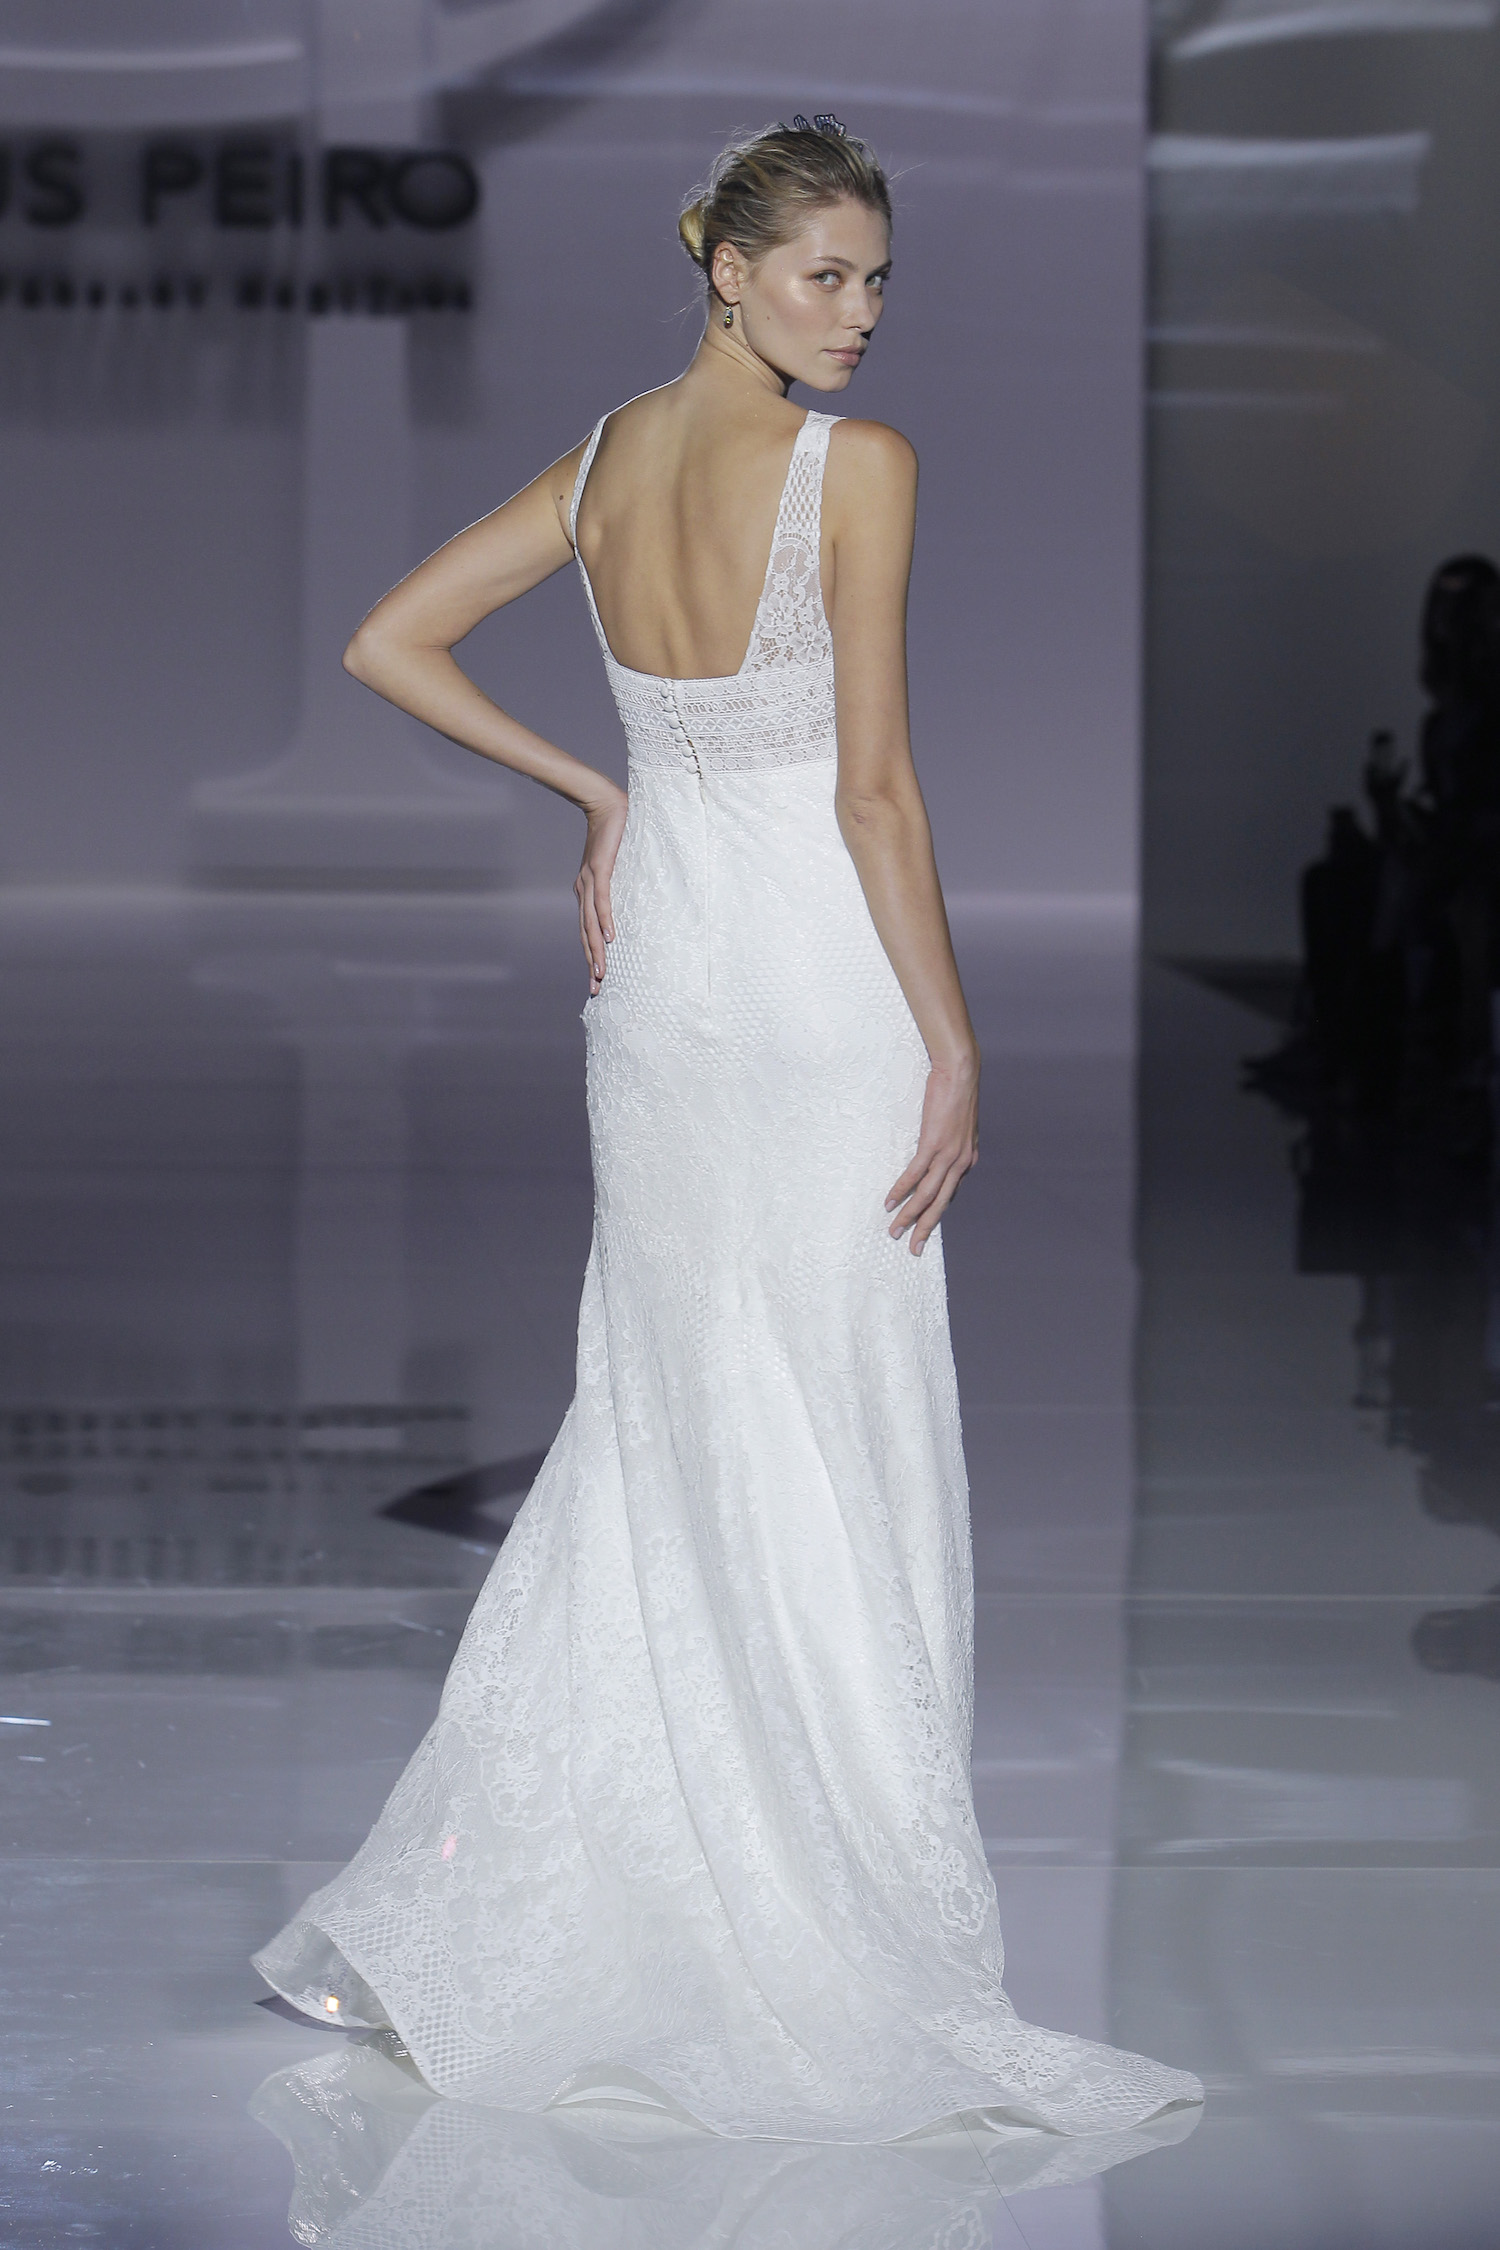 Magnífico Vestidos Novia Plumas Ideas Ornamento Elaboración ...